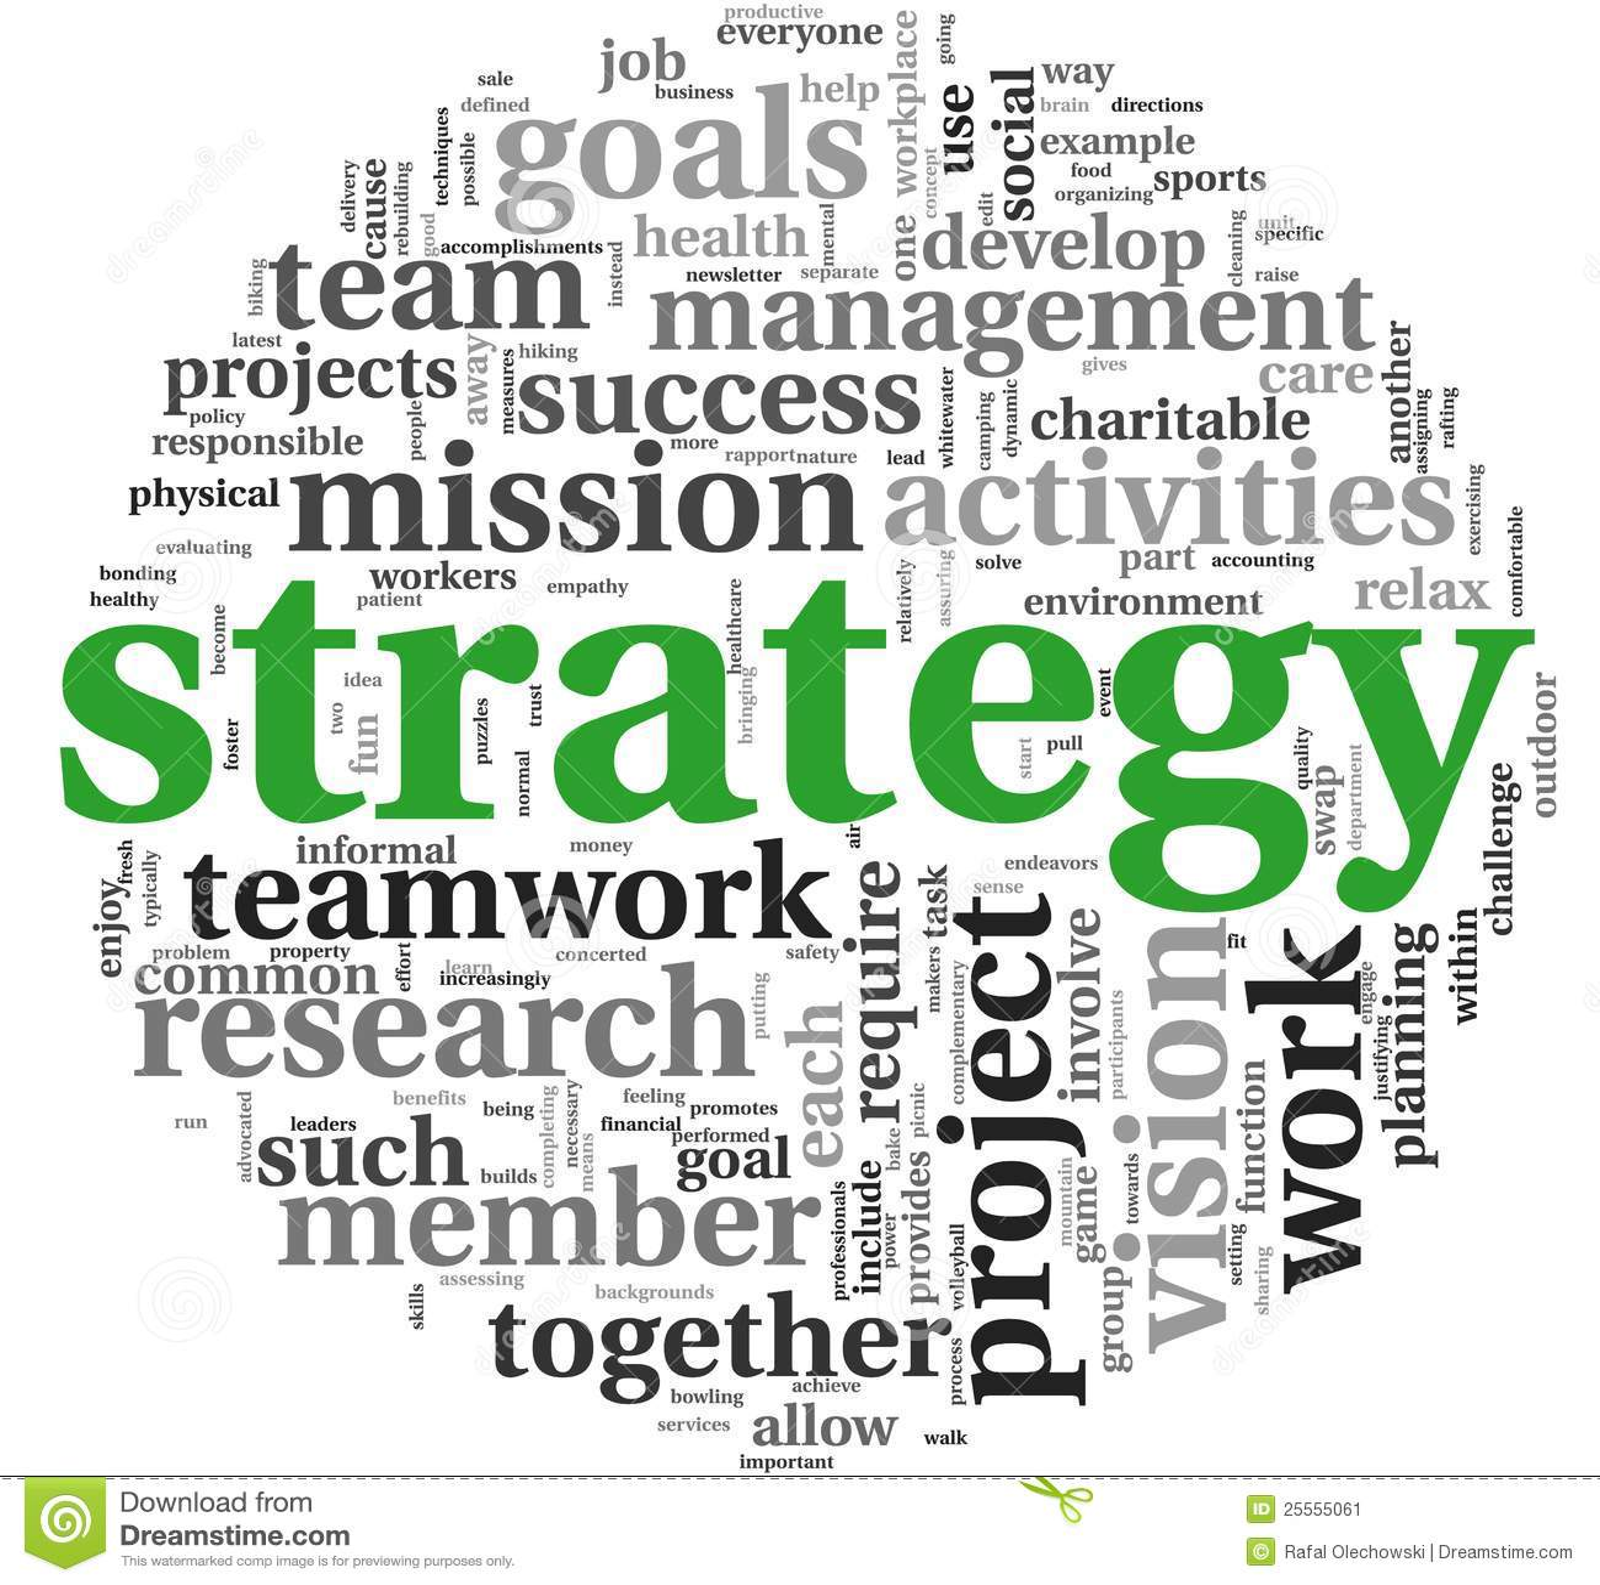 active bond portfolio strategies